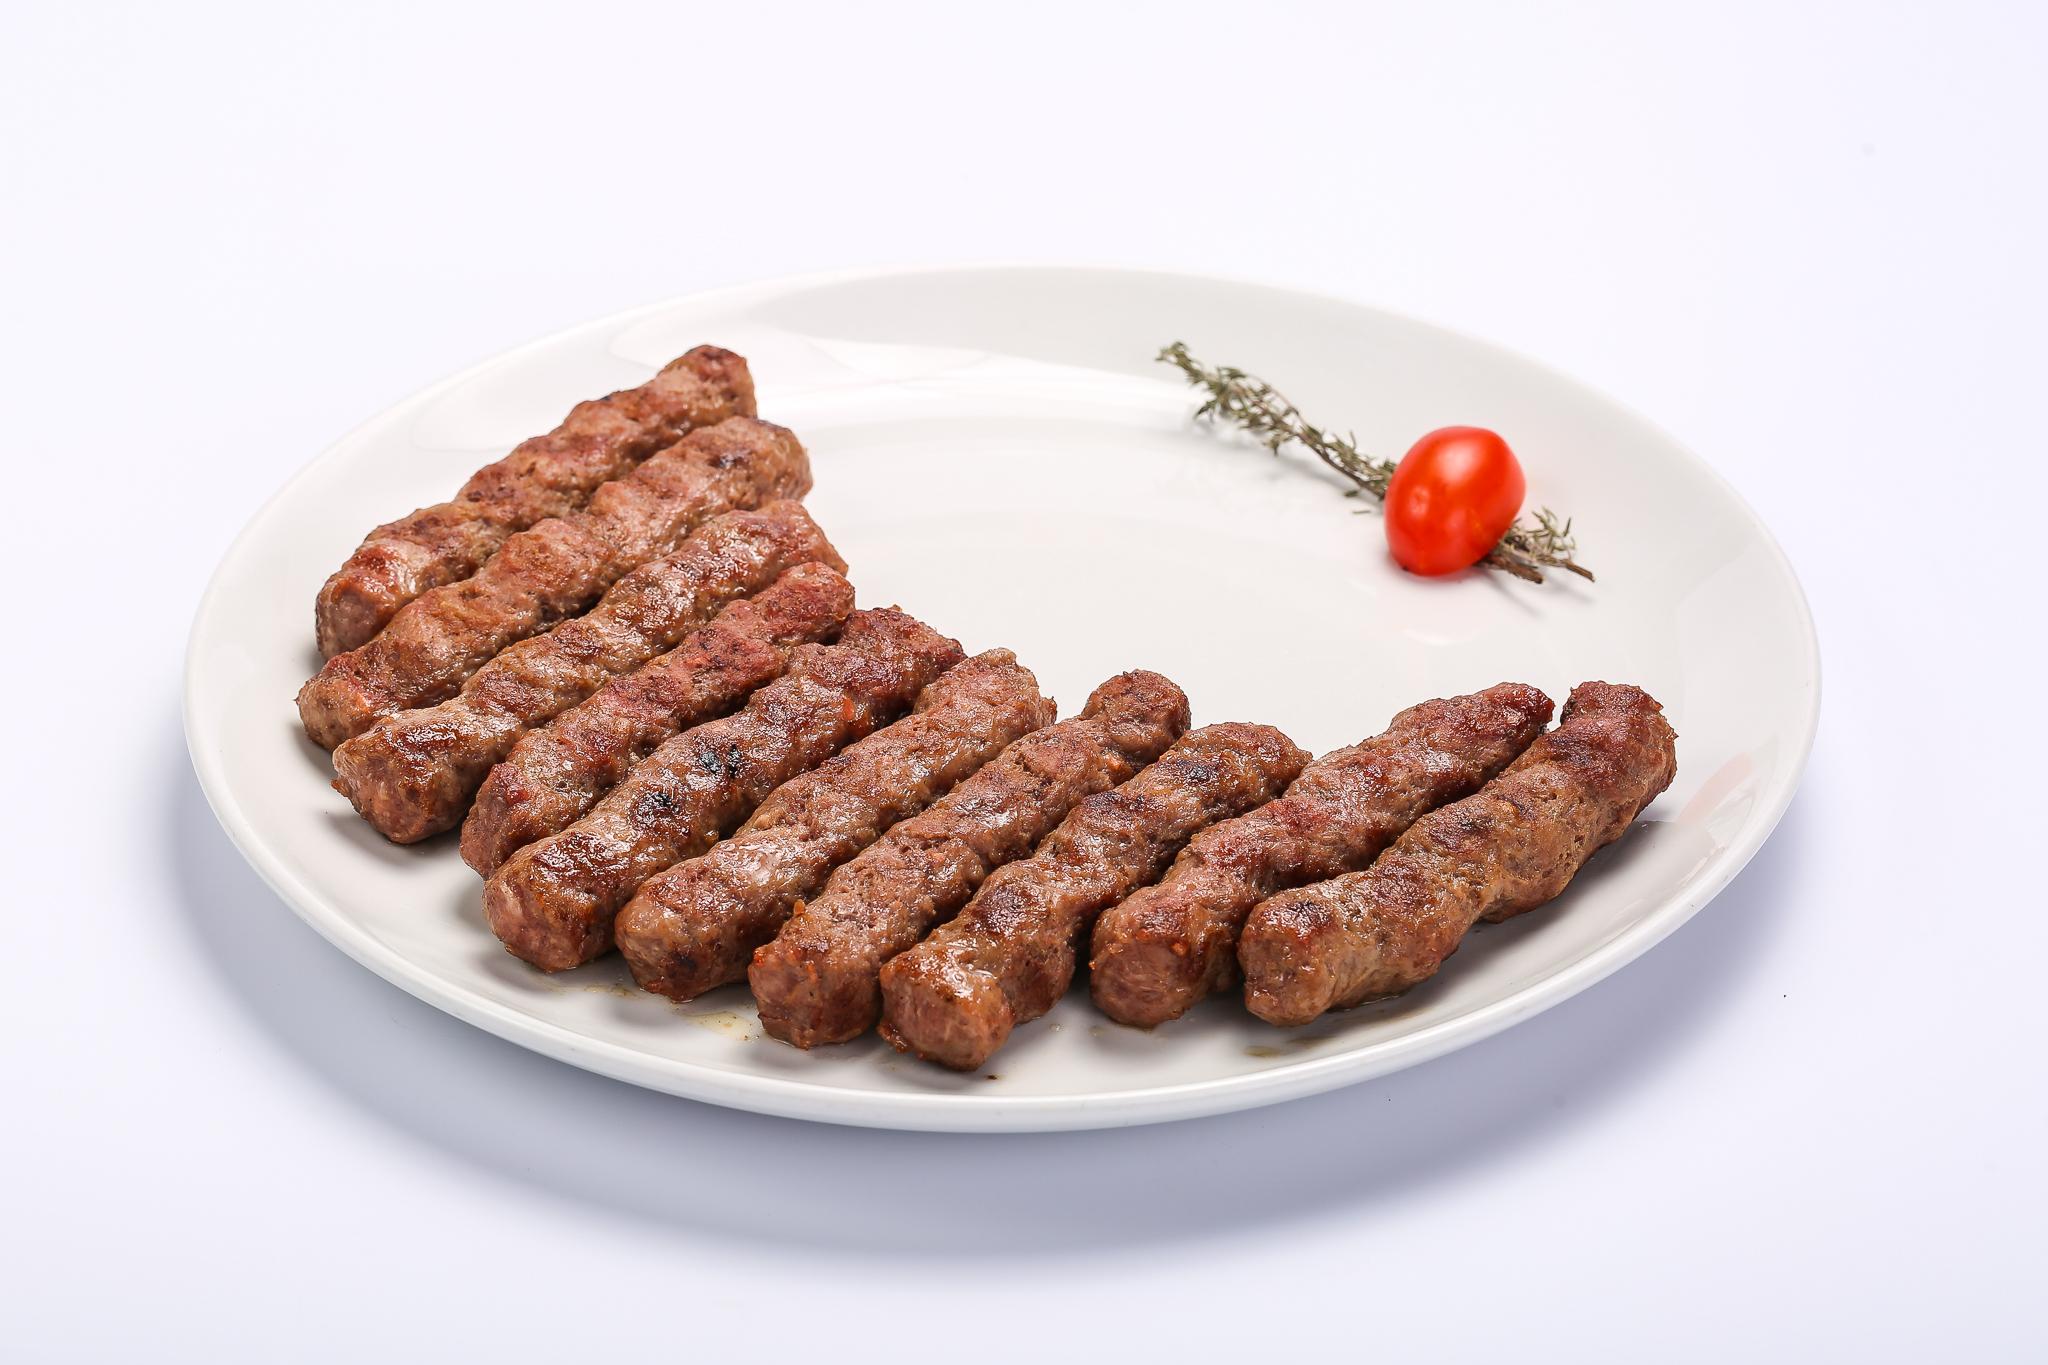 Mici sarbesti  Gusturi din Balcani. Mici românești Vs. Ćevapčići sârbești Mici sarbesti